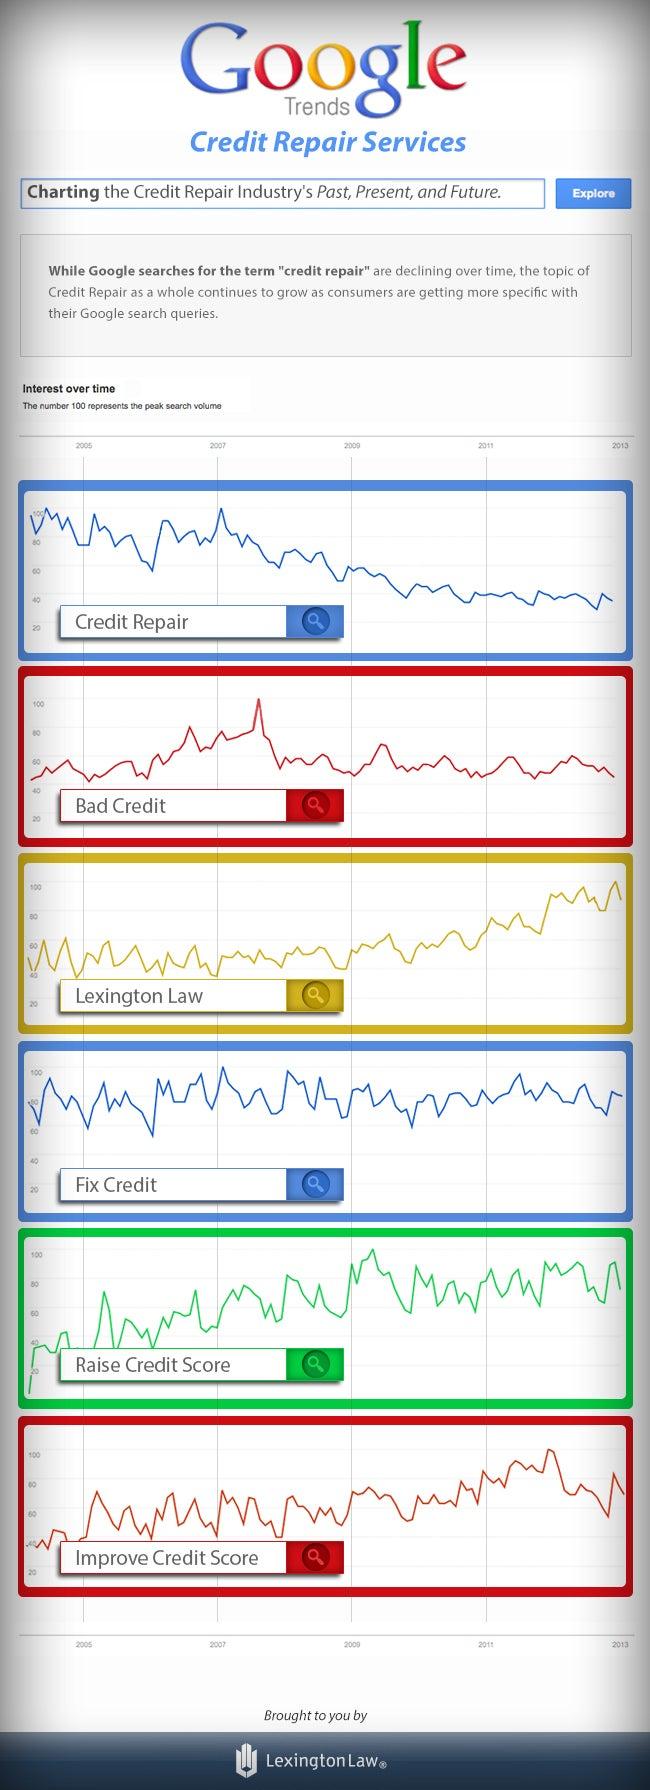 Google Trends of Credit Repair Services